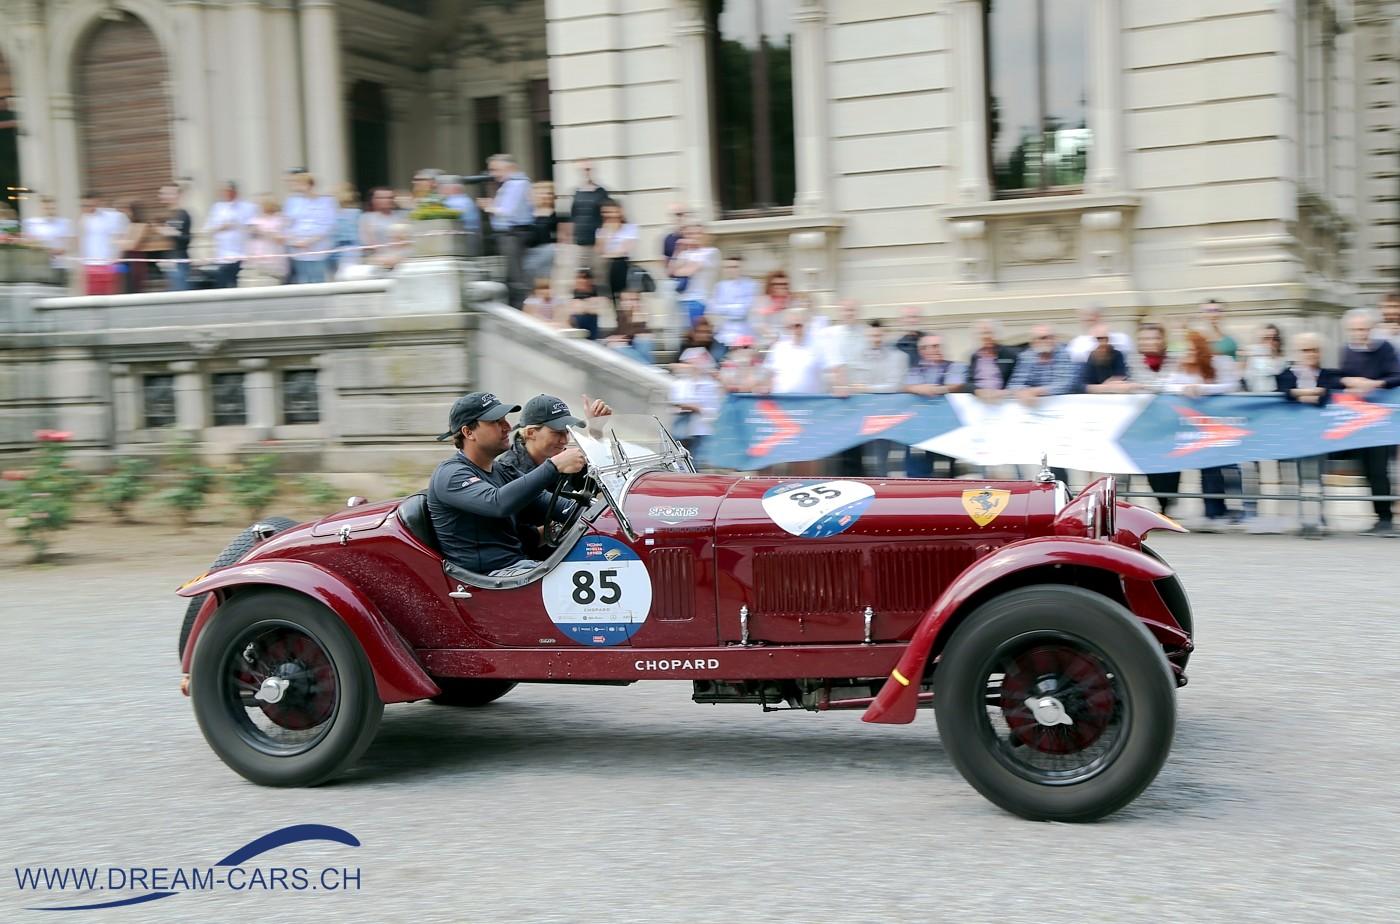 Mille Miglia 2018, Villa Mazzotti, Chiari. Das Siegerteam Juan Tonconogy / Barbara Ruffini aus Argentinien, auf Alfa Romeo 6C 1500 GS 'Testa Fissa' von 1933.